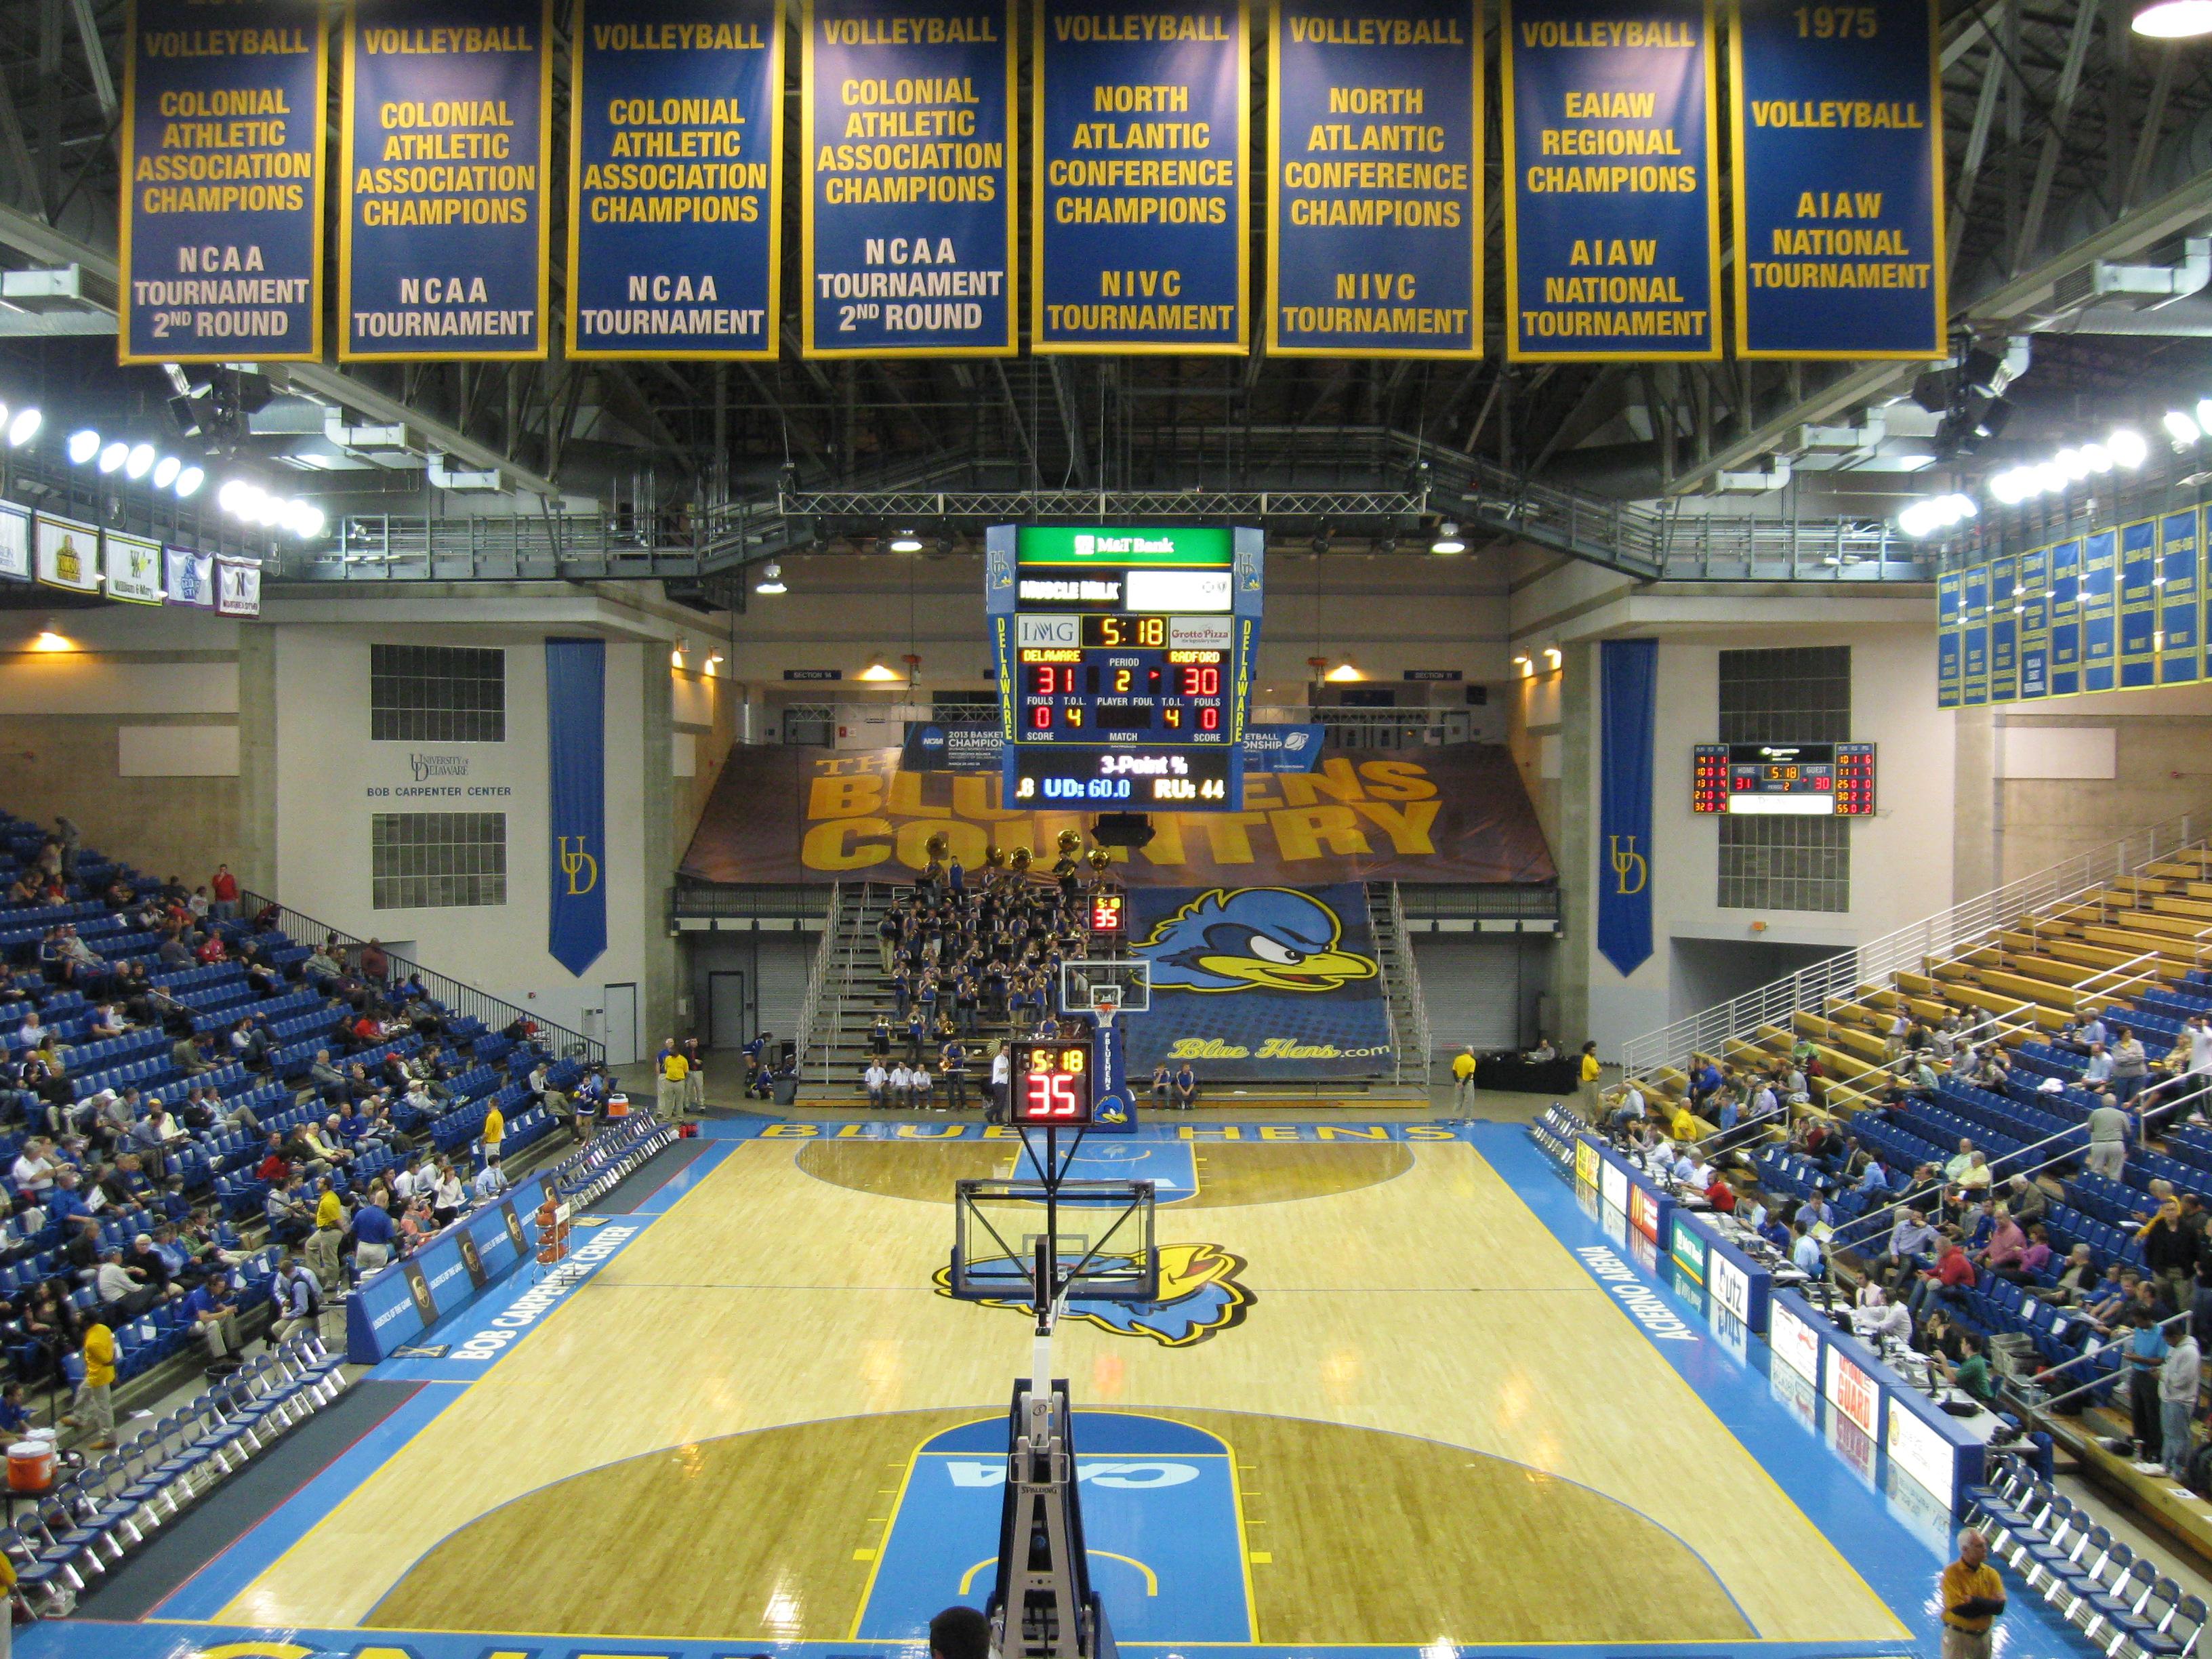 Bob Carpenter Center Stadium And Arena Visits